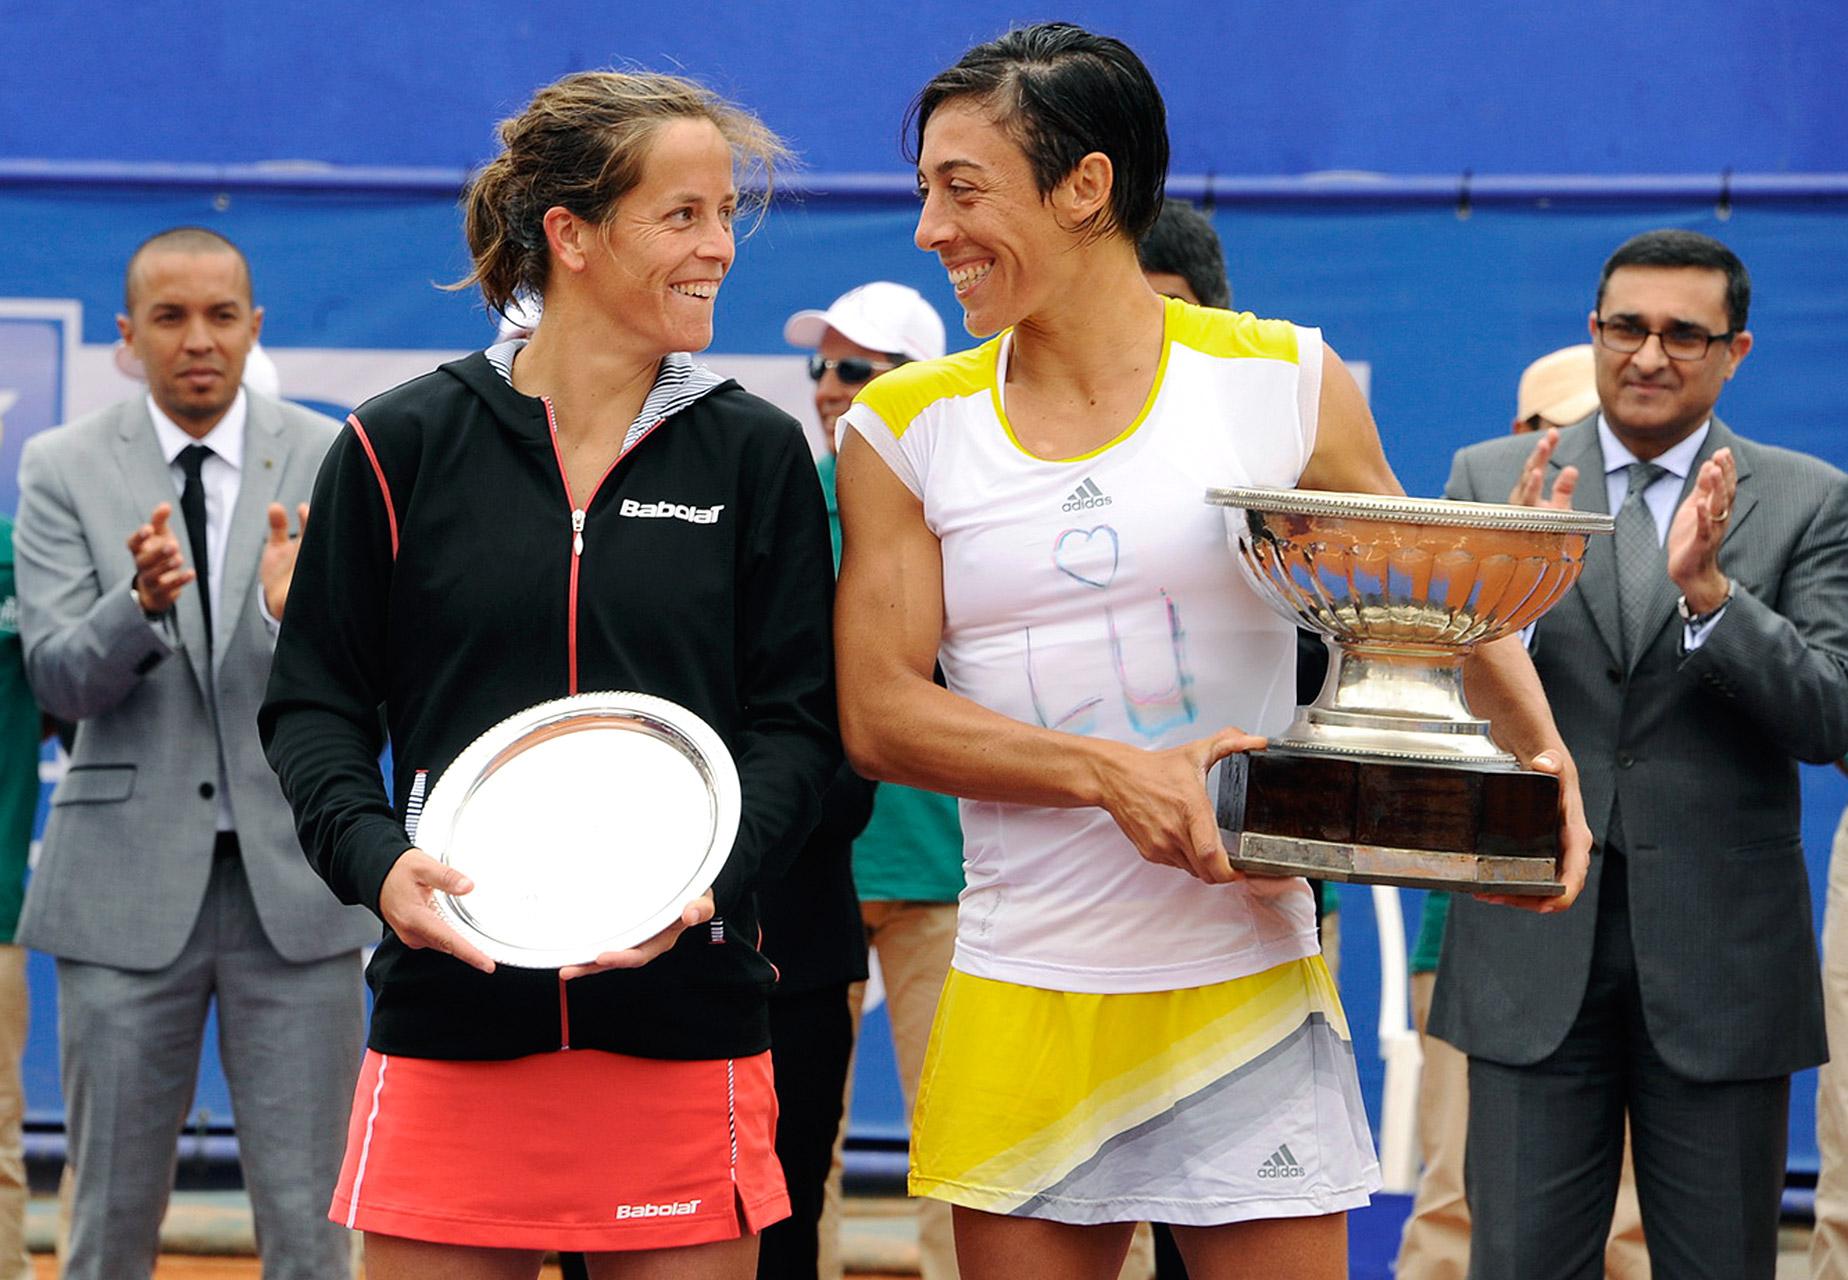 Francesca Schiavone and Lourdes Dominguez Lino